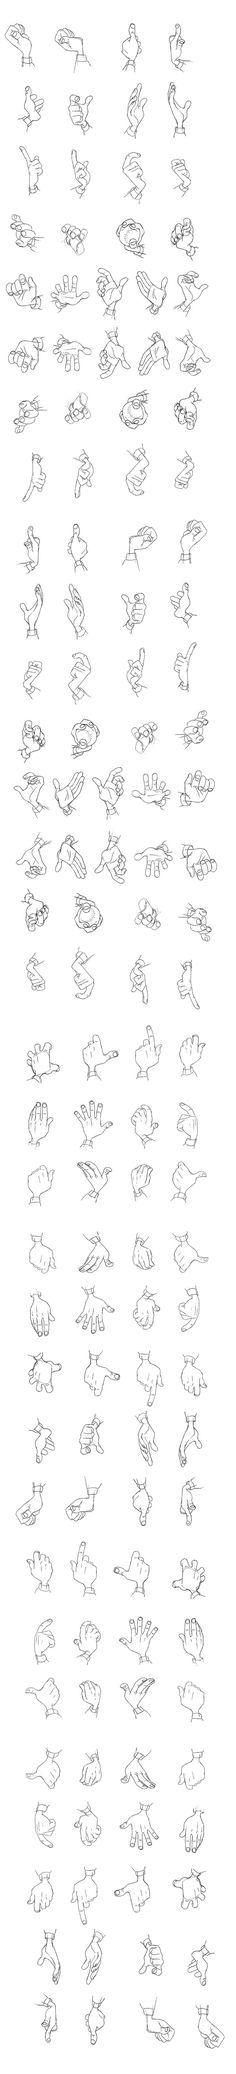 """Hogarth"" Hands Reference Sheet The Iron Giant | © Warner Bros. Animation* • Blog/Website | (www.warnerbros.com):"